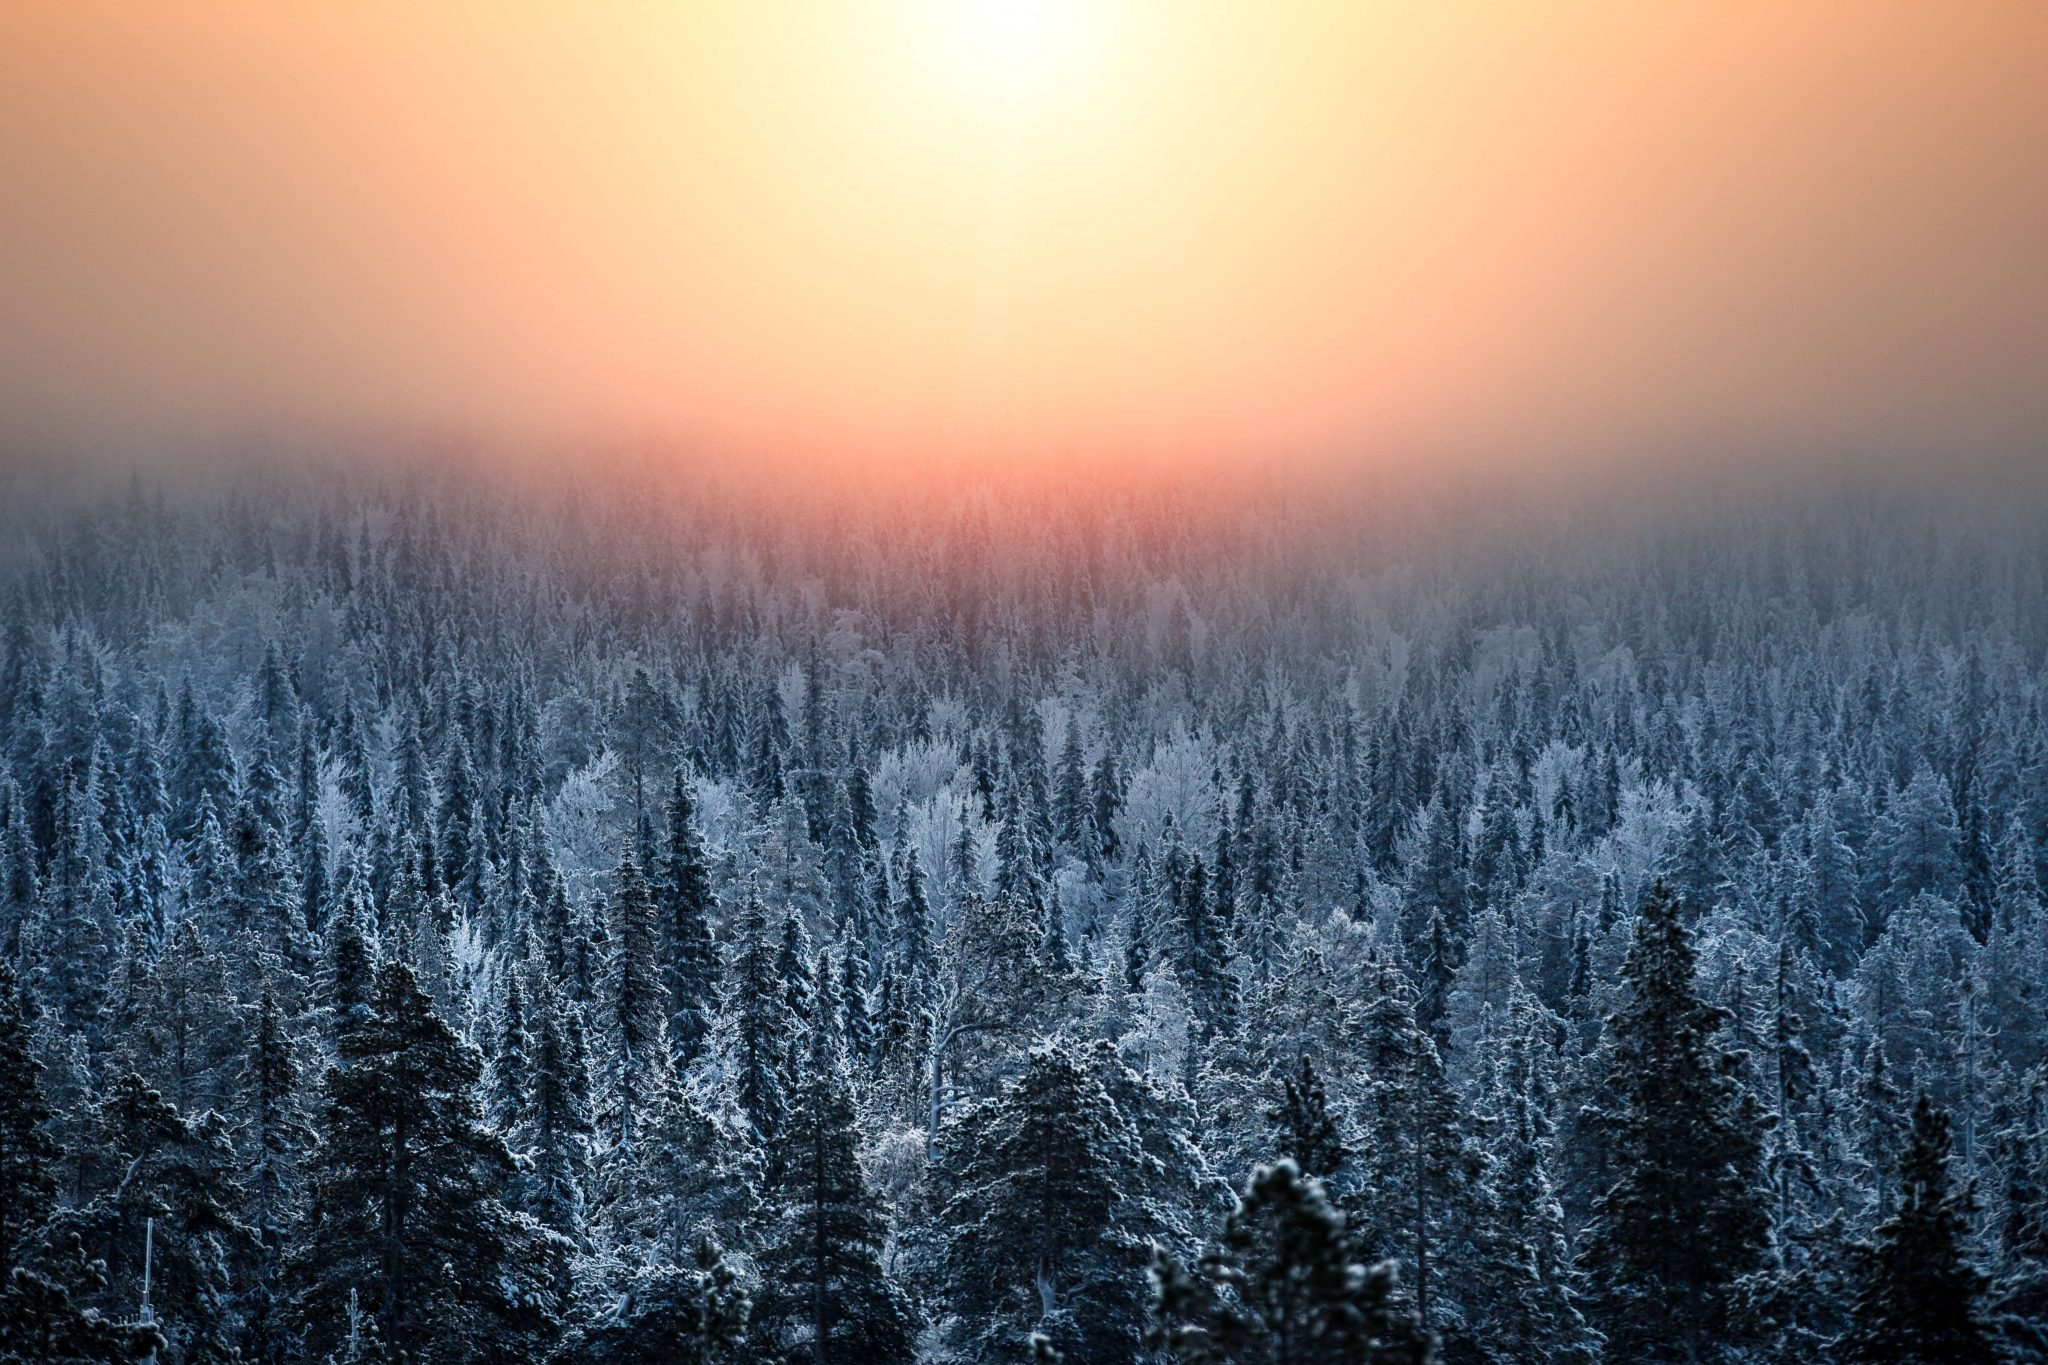 Explore Finland: 7 Fun Travel Challenges